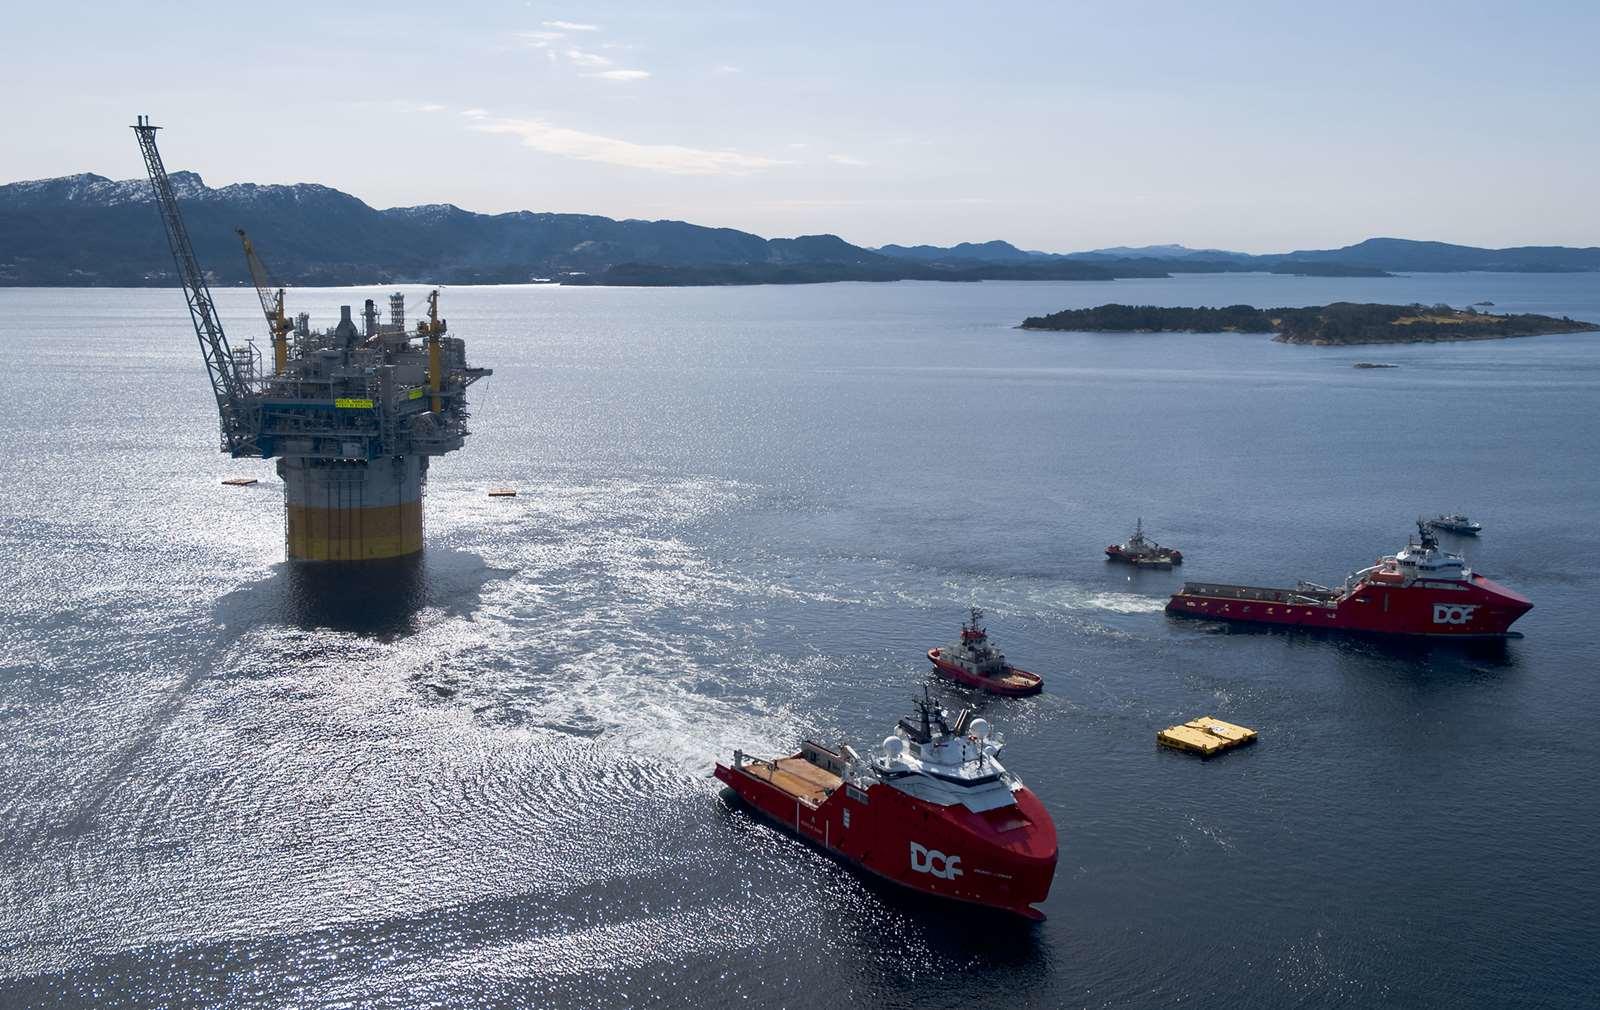 DOF vessels Skandi Vega and Skandi Iceman towing the Aasta Hansteen spar platform.